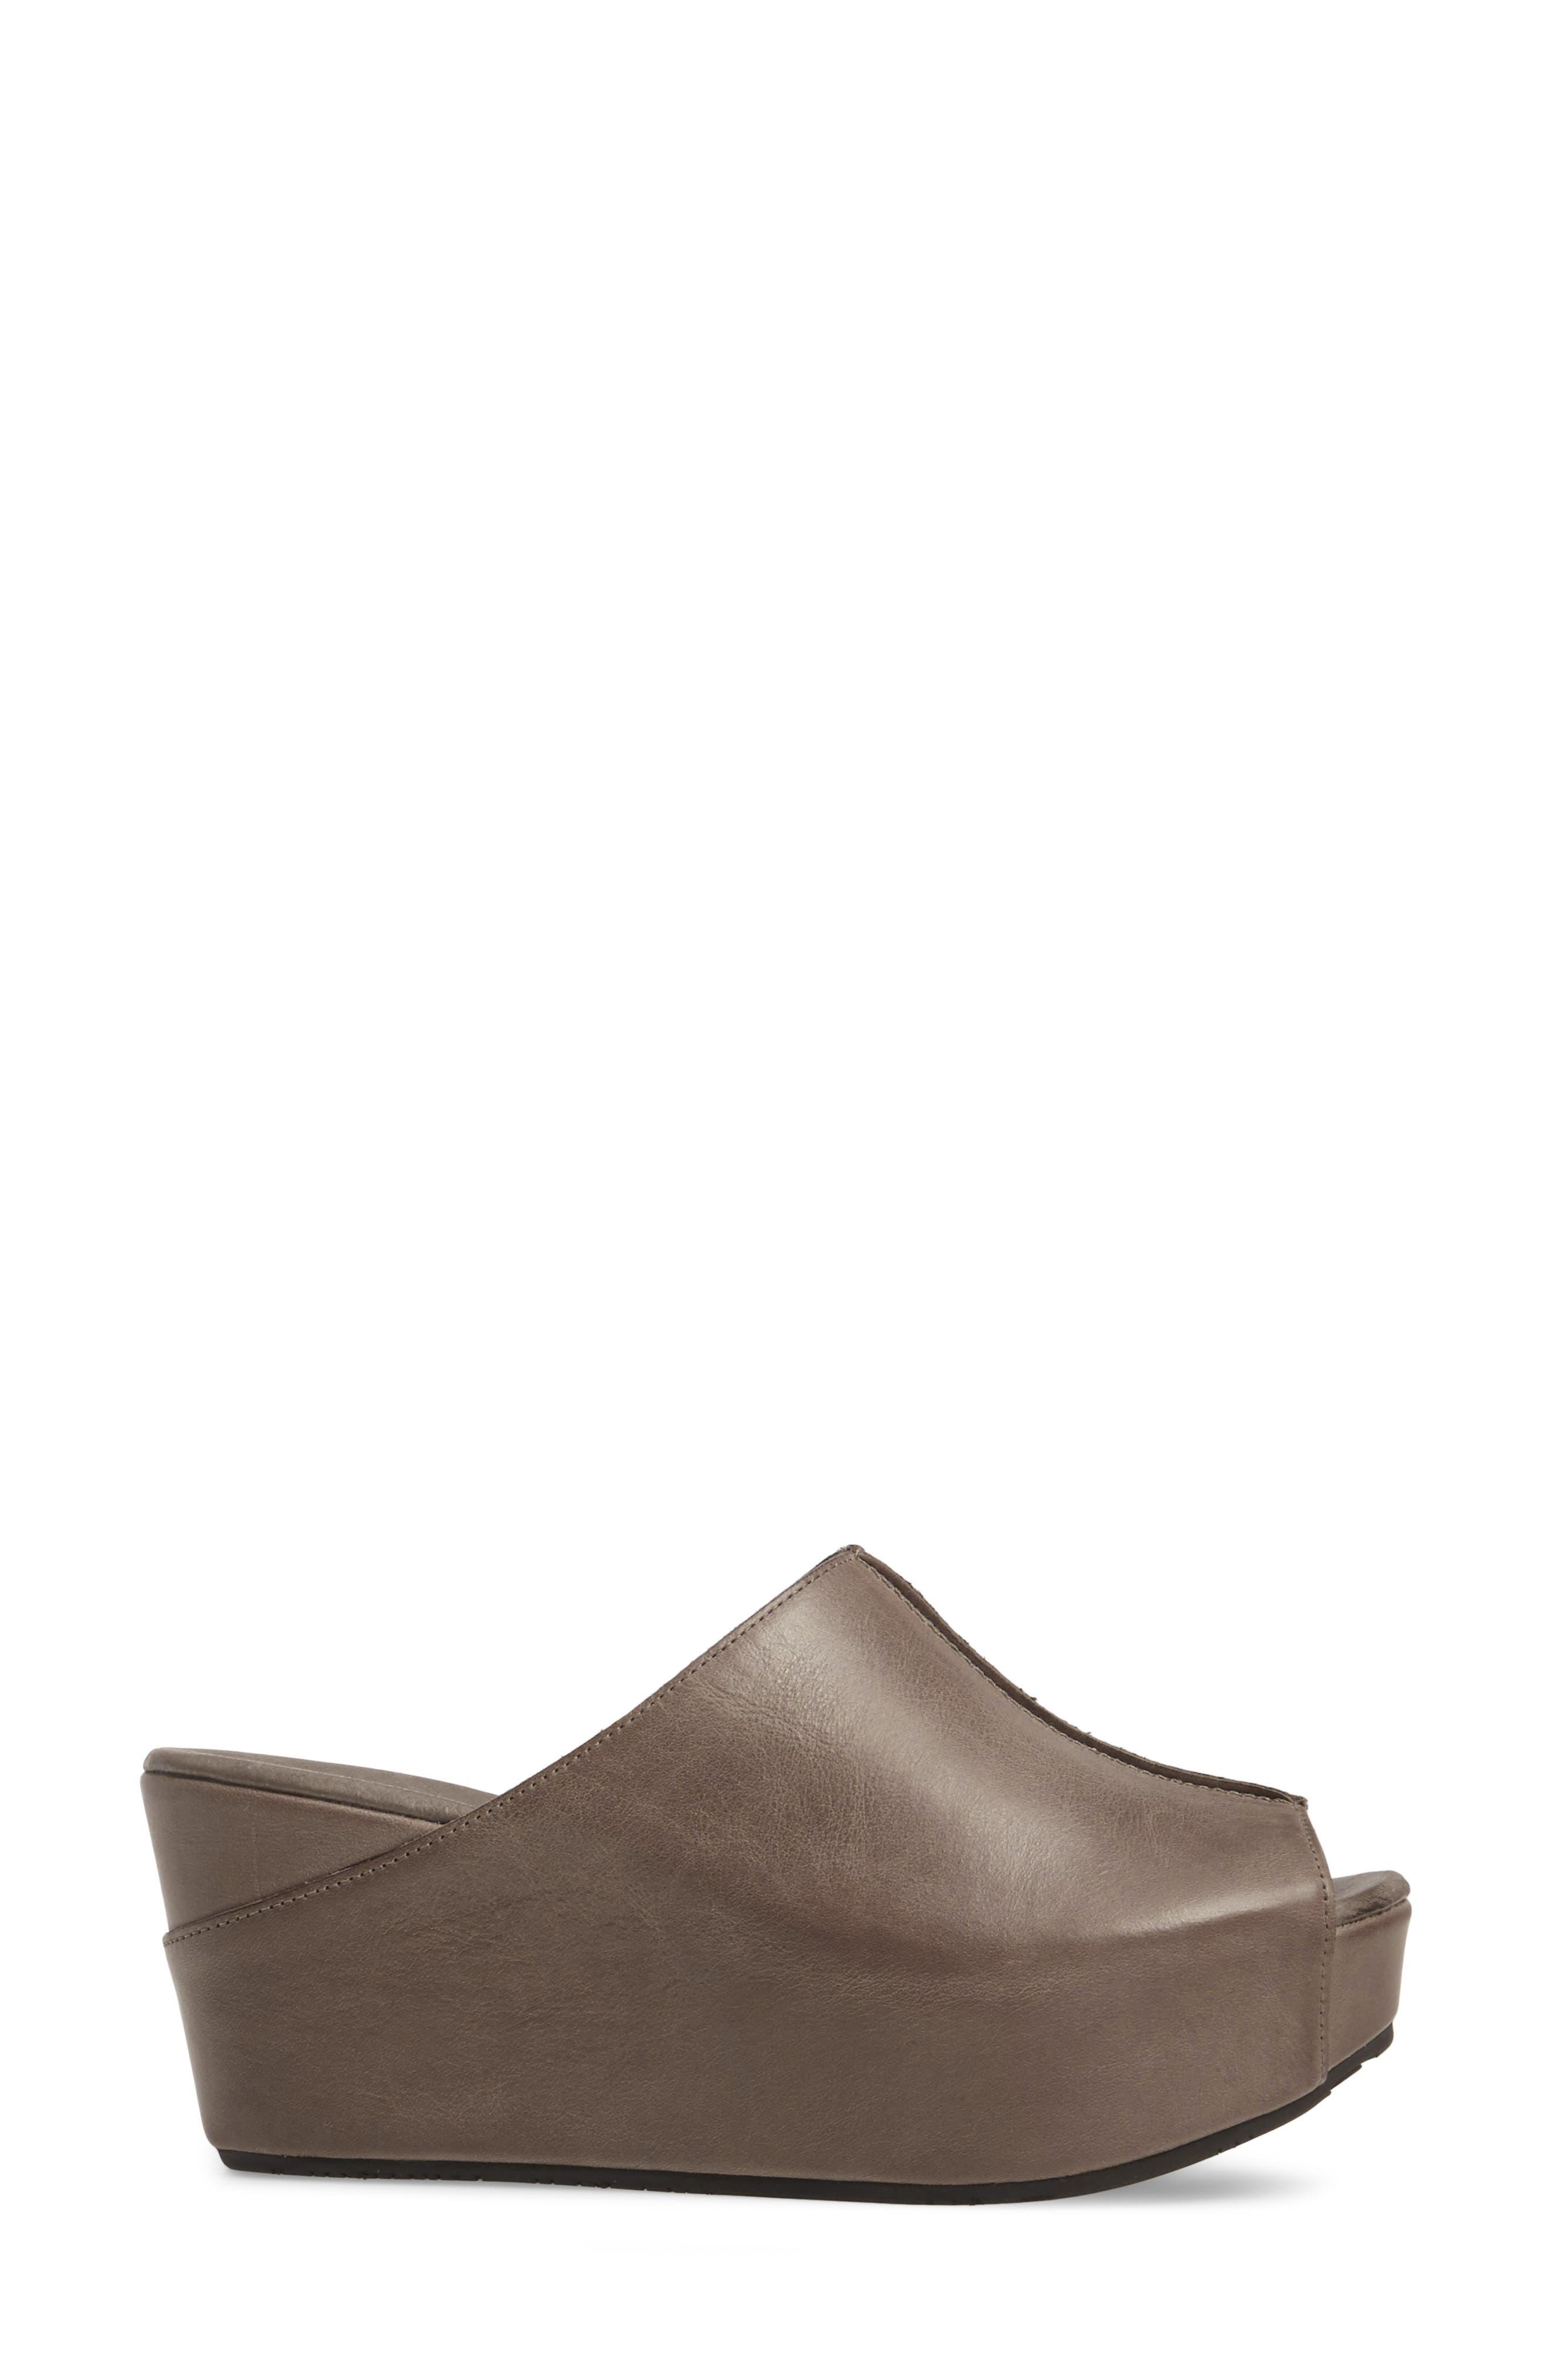 Wynn Peep Toe Mule,                             Alternate thumbnail 3, color,                             Graphite Leather